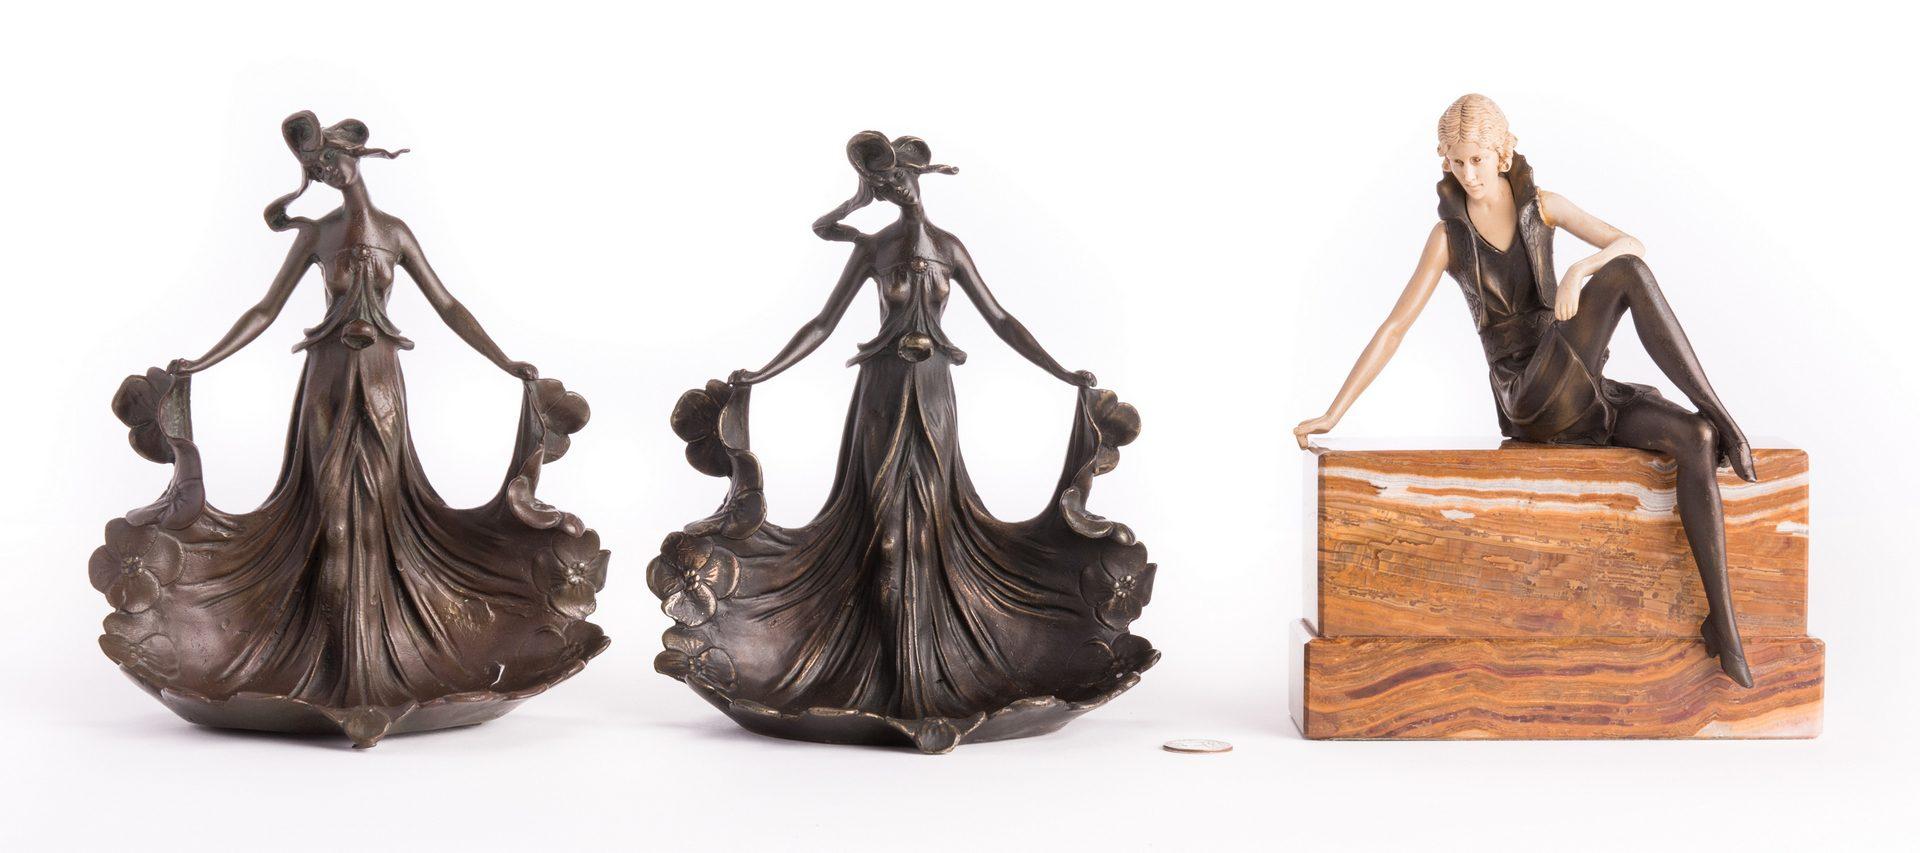 Lot 183: 3 Bronze Female Figures, inc. after Carlier